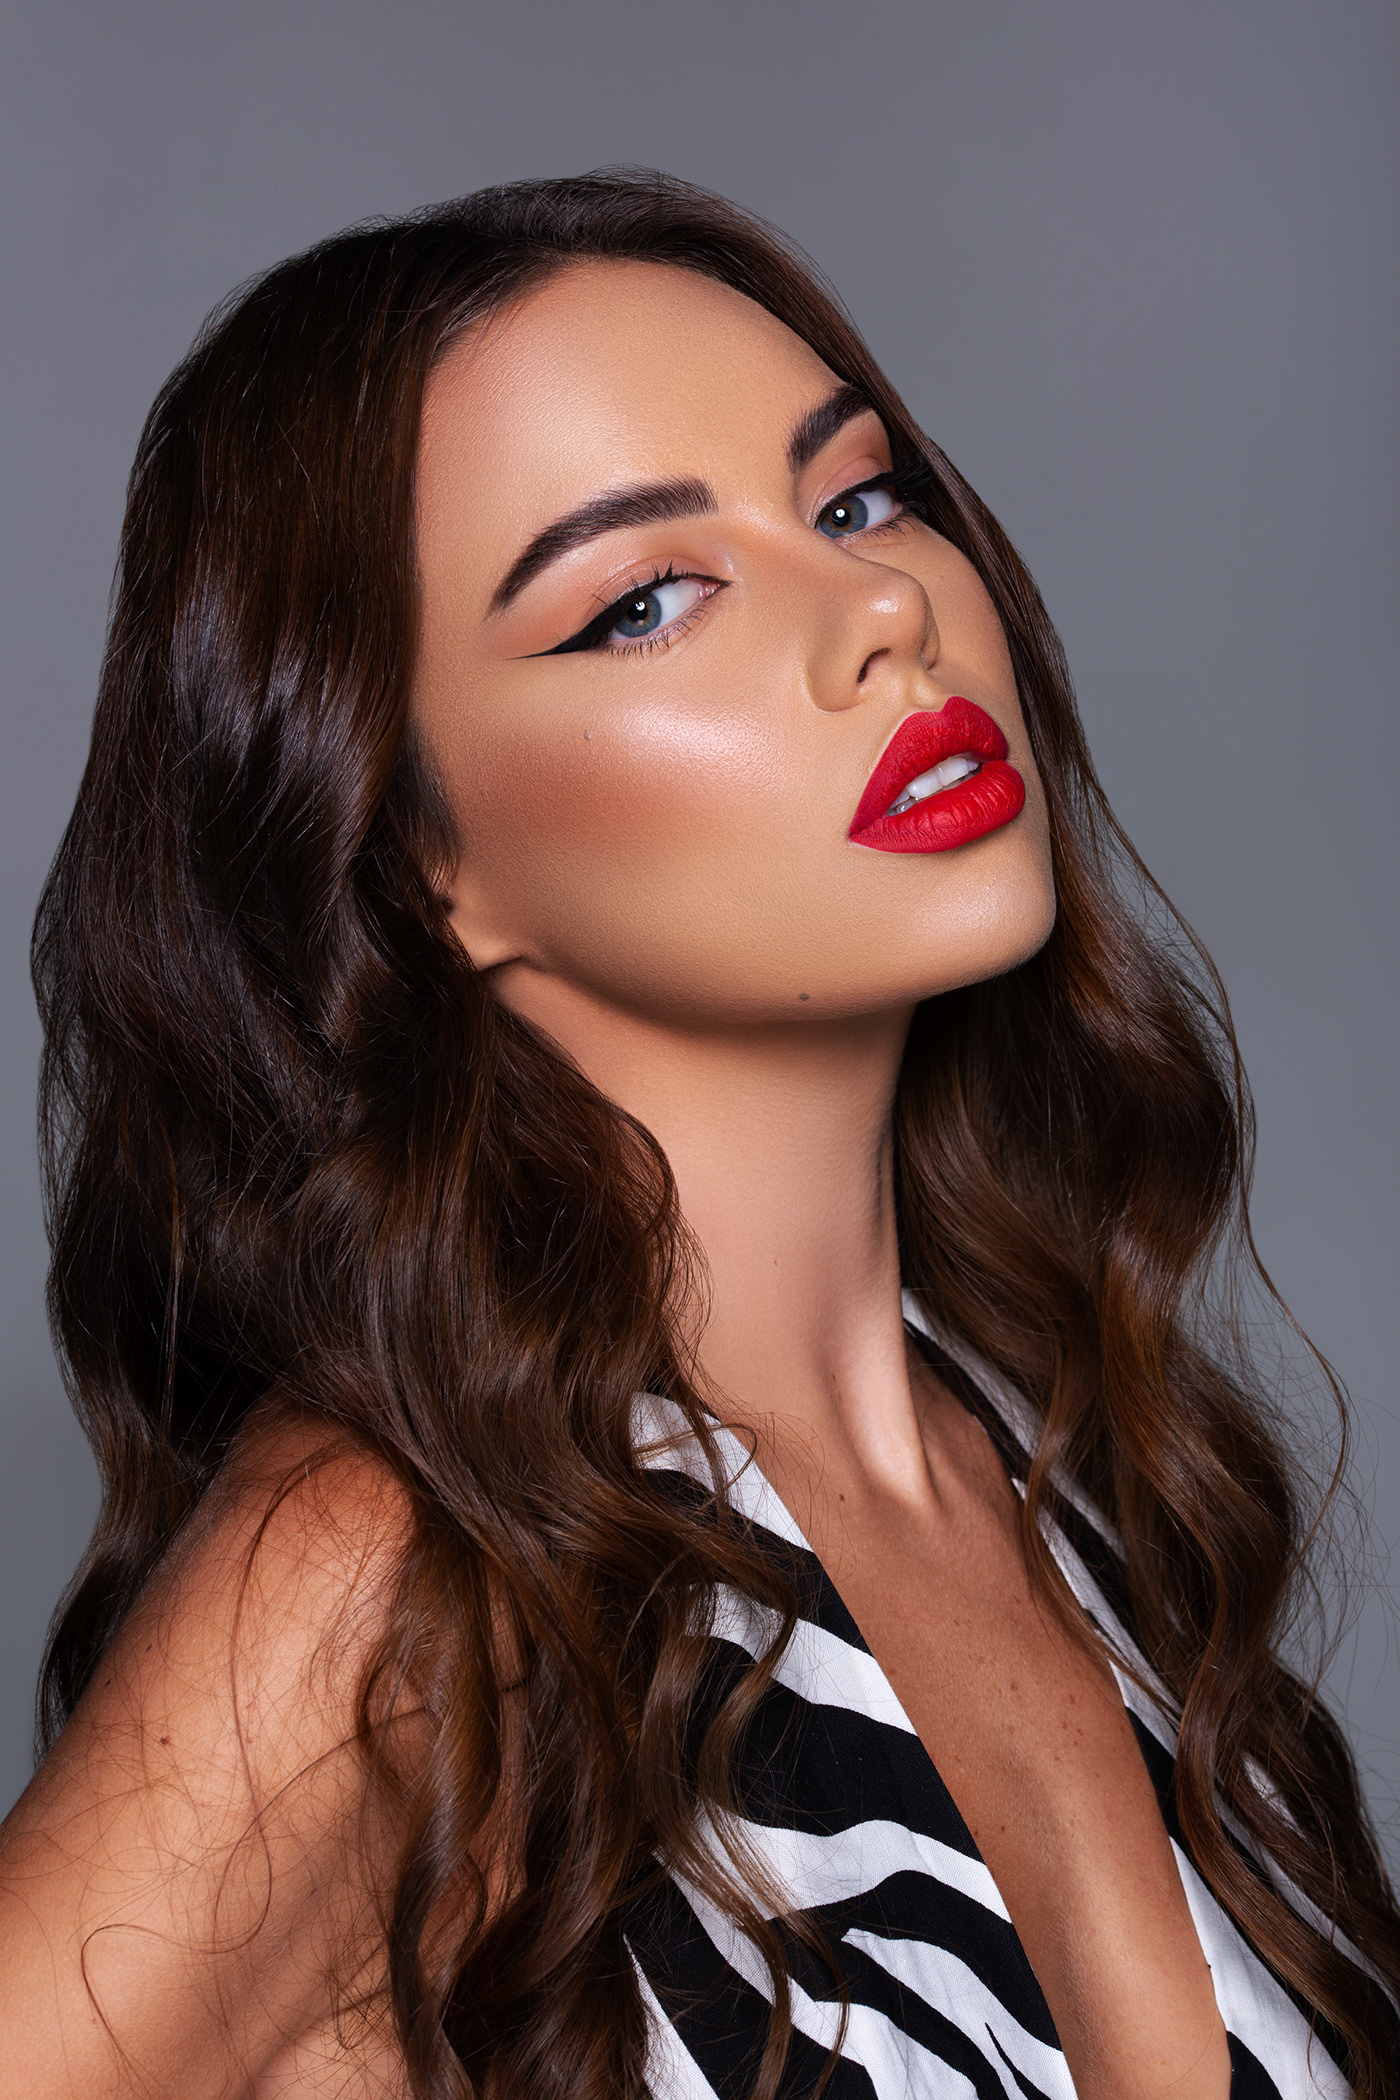 beauty Fashion  hair makeup model Photography  portrait retouch skin woman